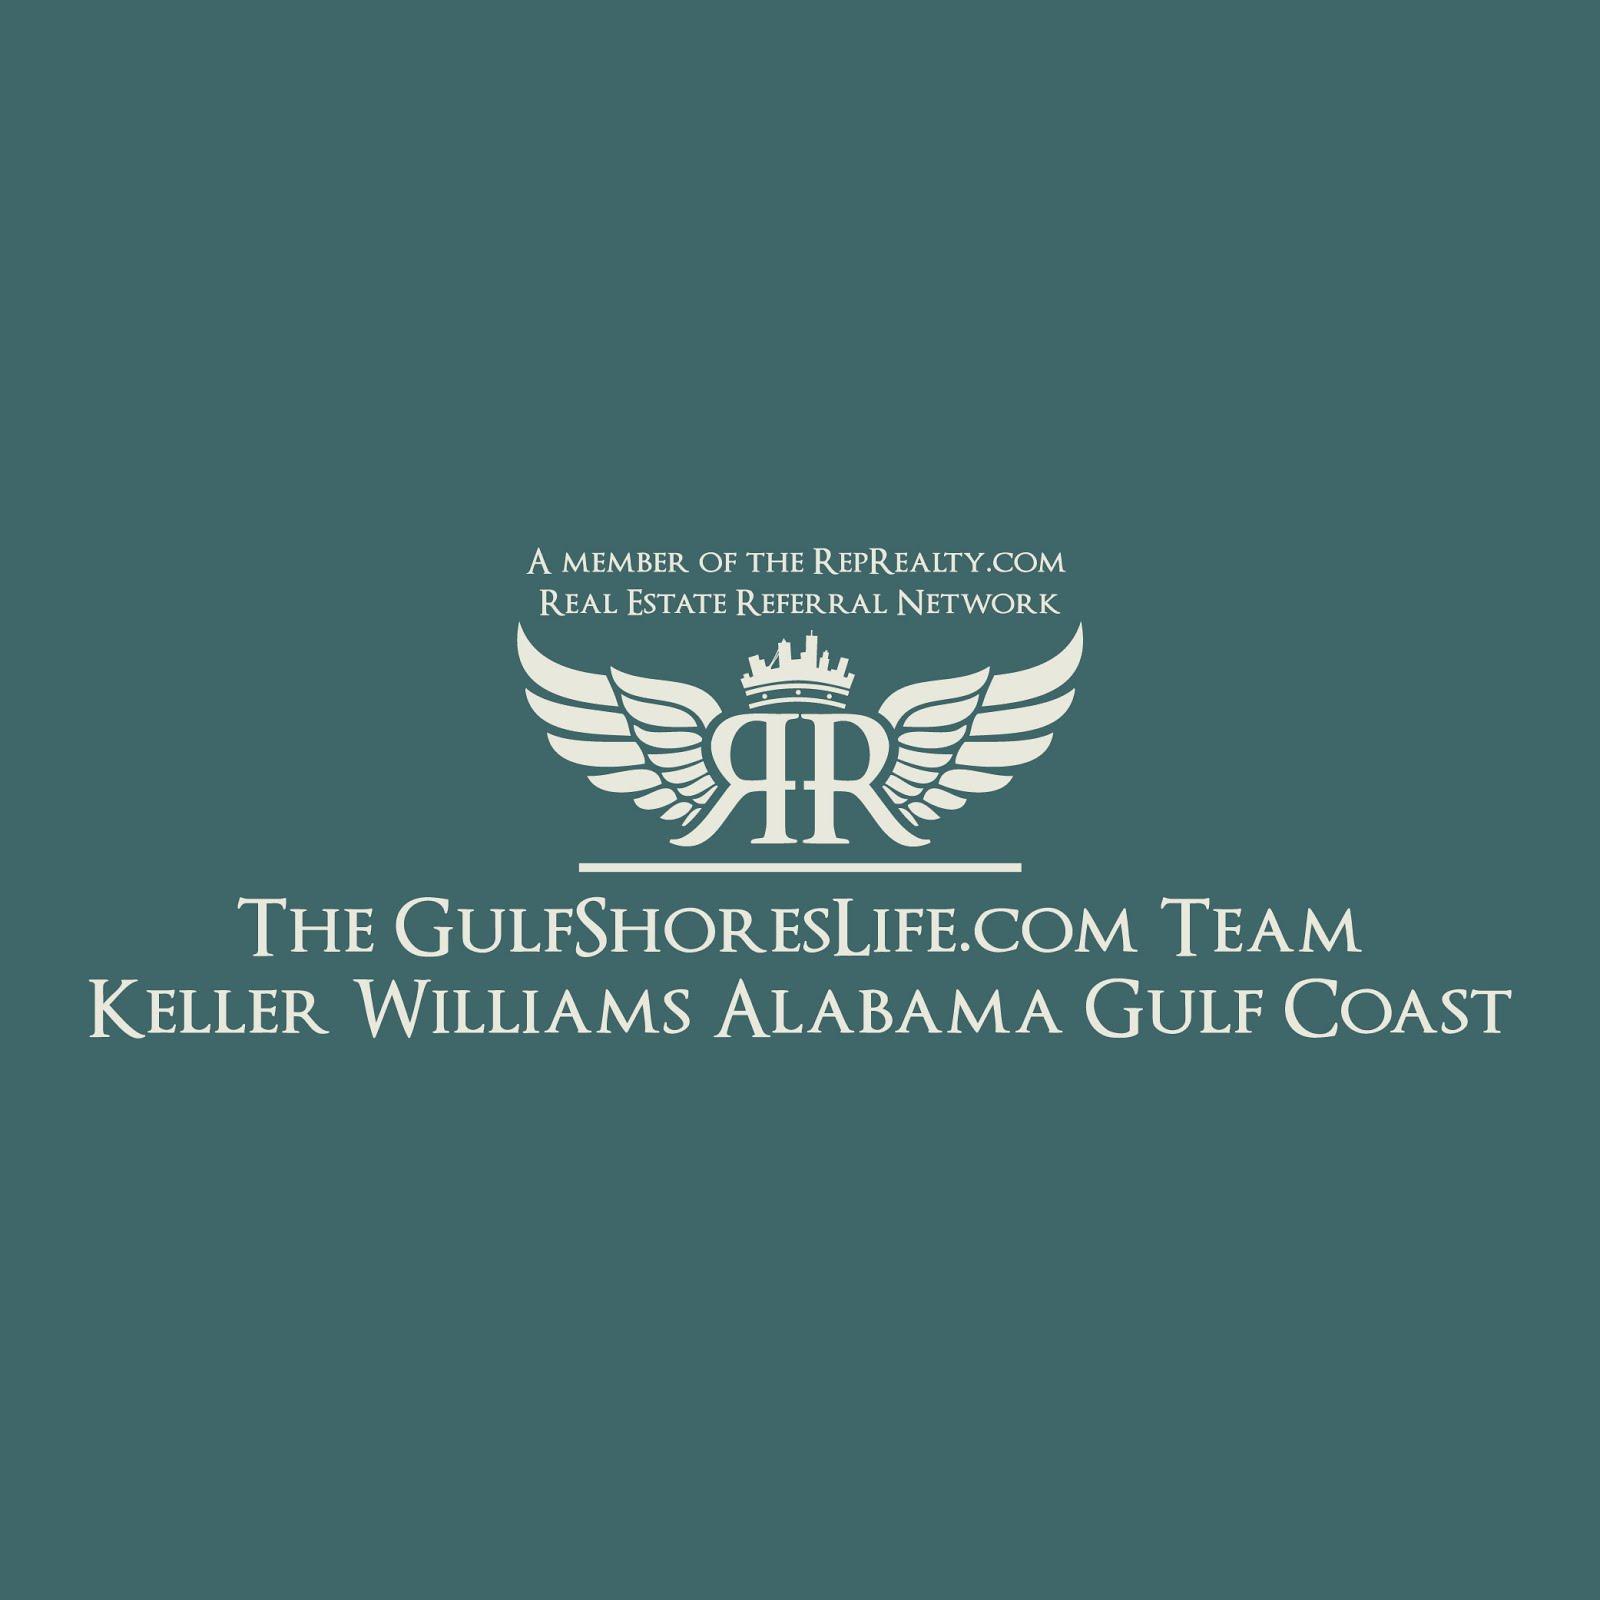 Cal Carter - Keller Williams Alabama Gulf Coast